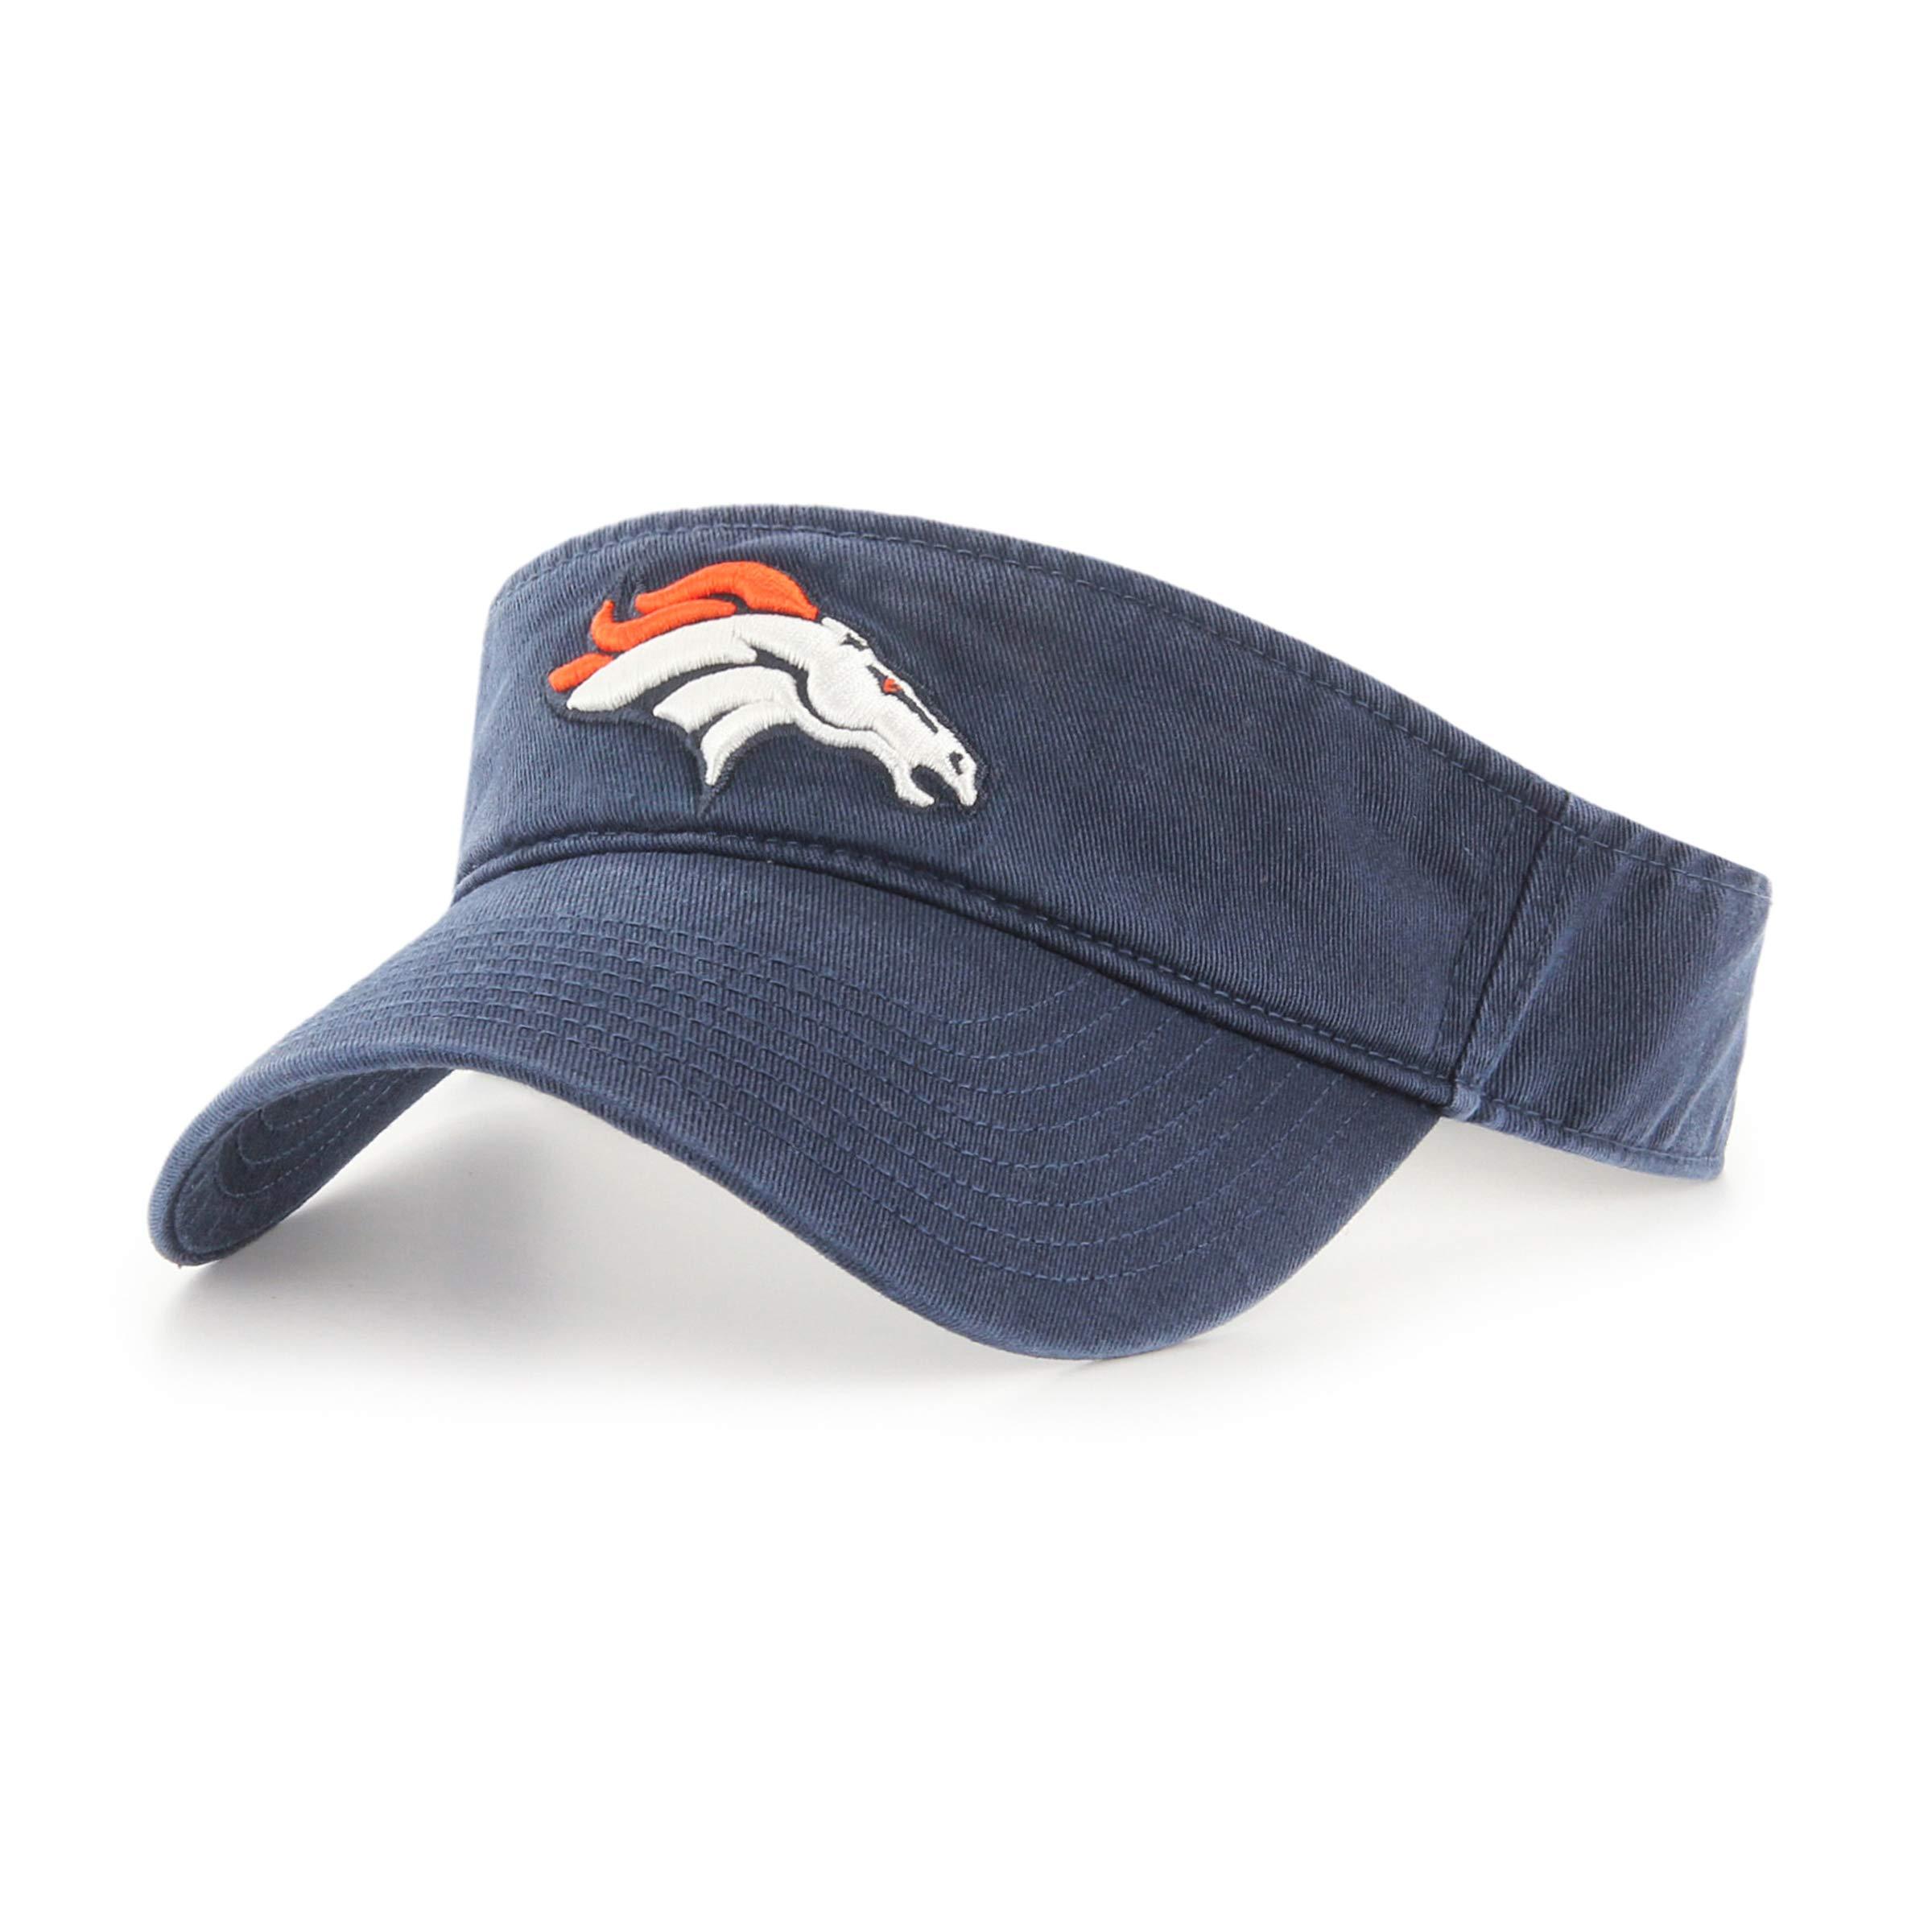 OTS NFL Denver Broncos Male Visor, Navy, One Size